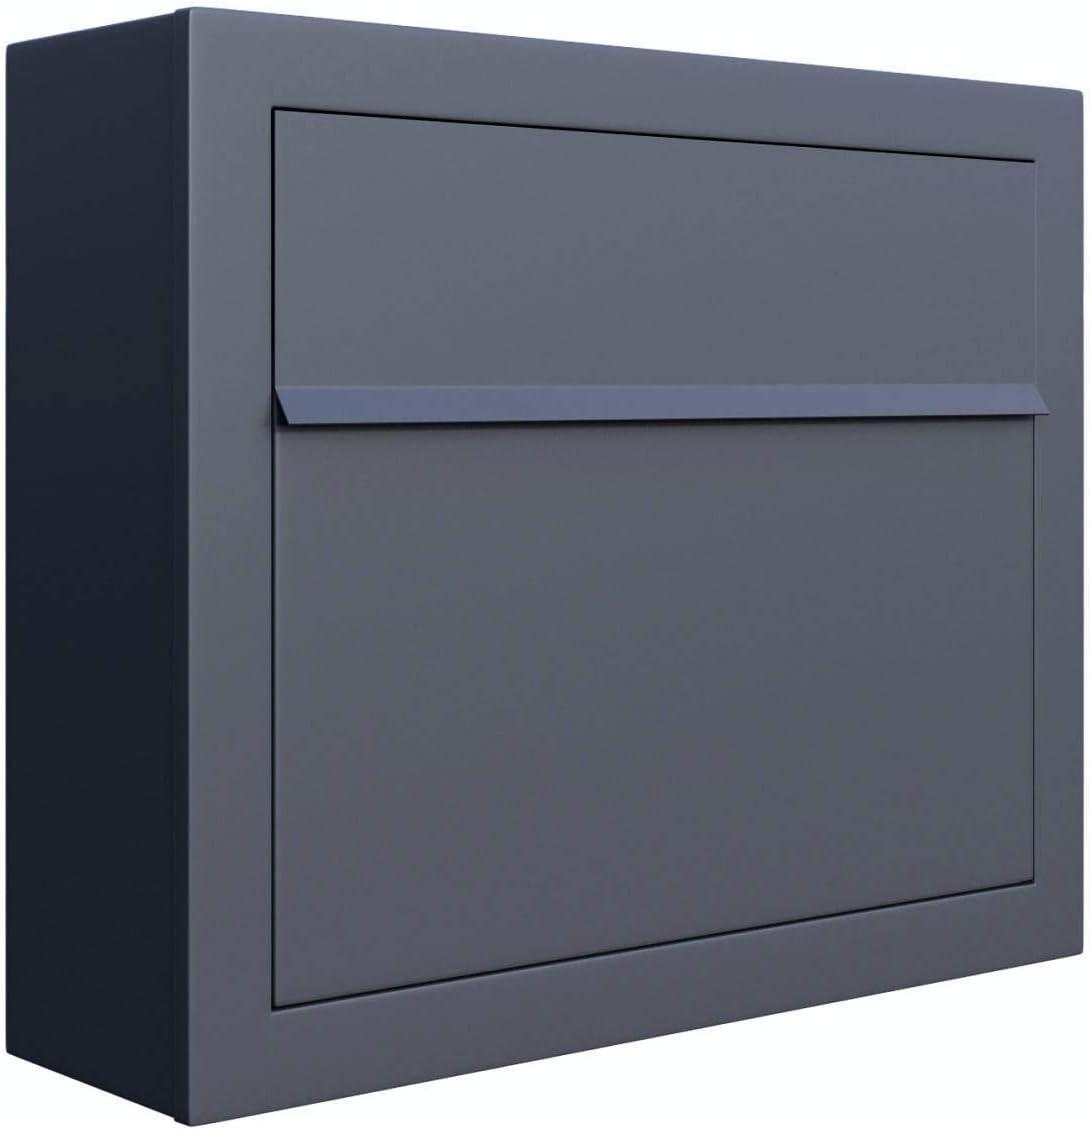 Elegance- Baltimore Mall Contemporary Designer Mailbox Discount is also underway Anthrac Powder-Coated in